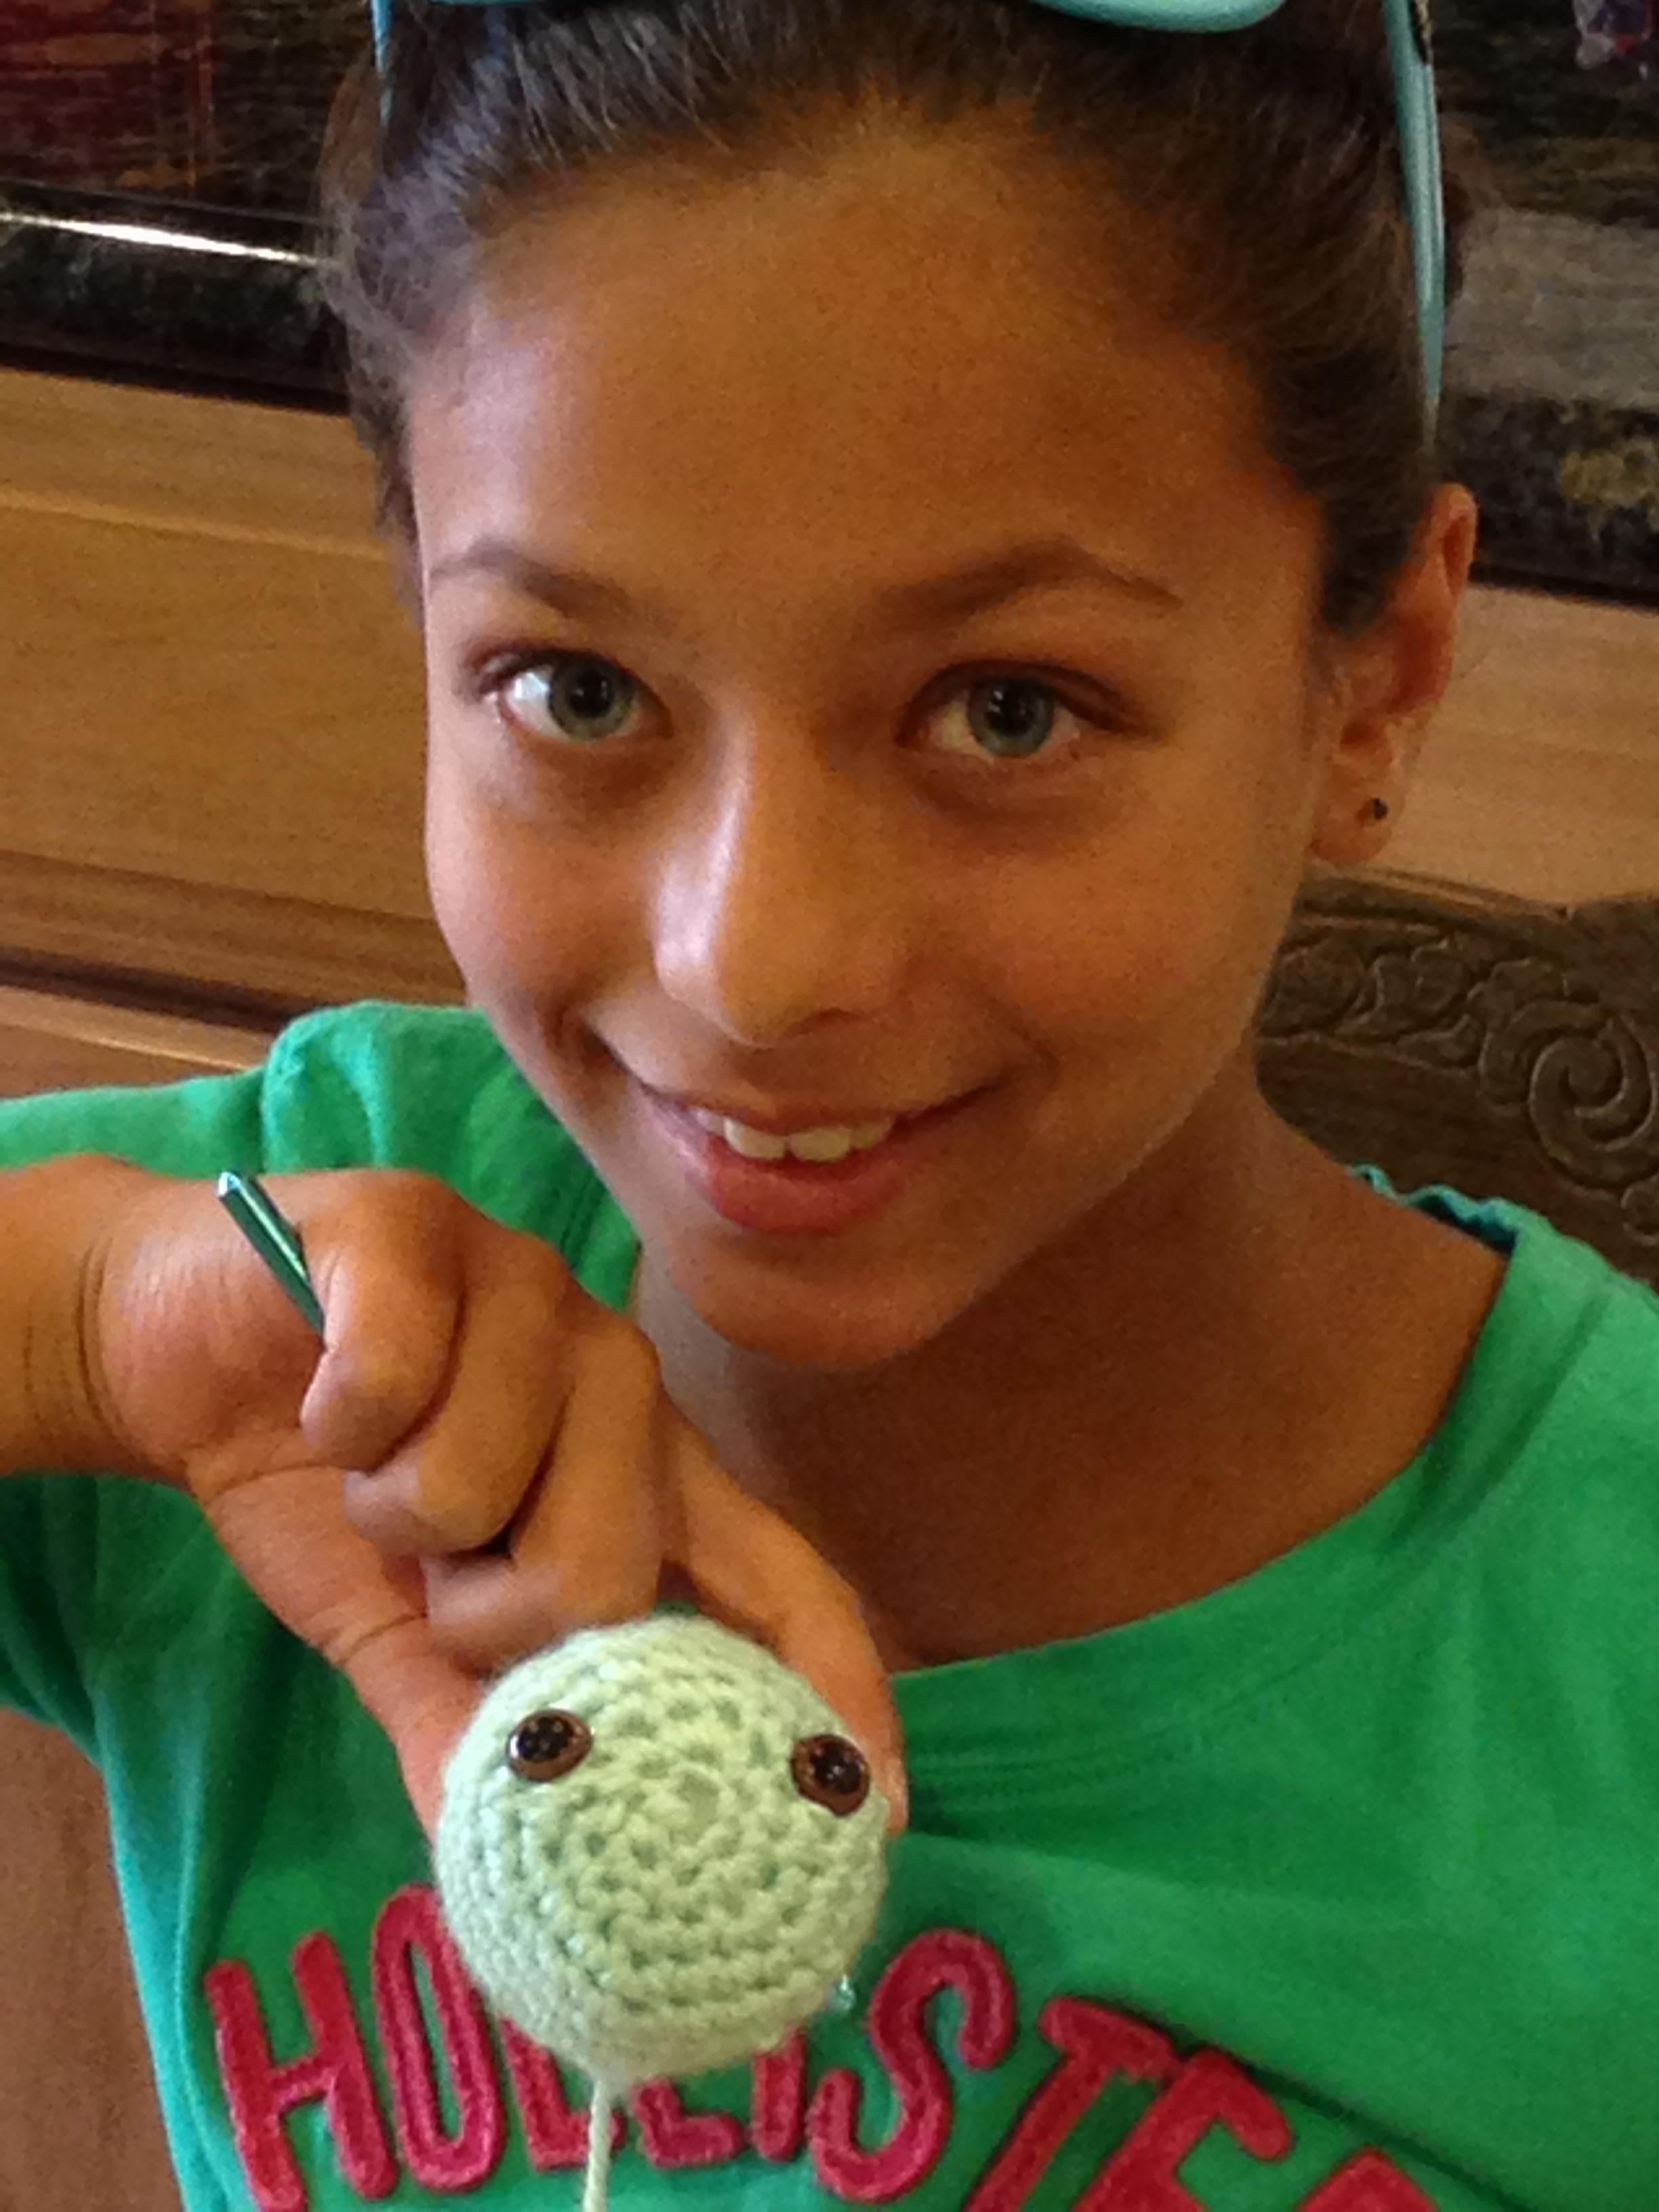 Crochet Amigurumi Panda Bear Head by 10 Year Old